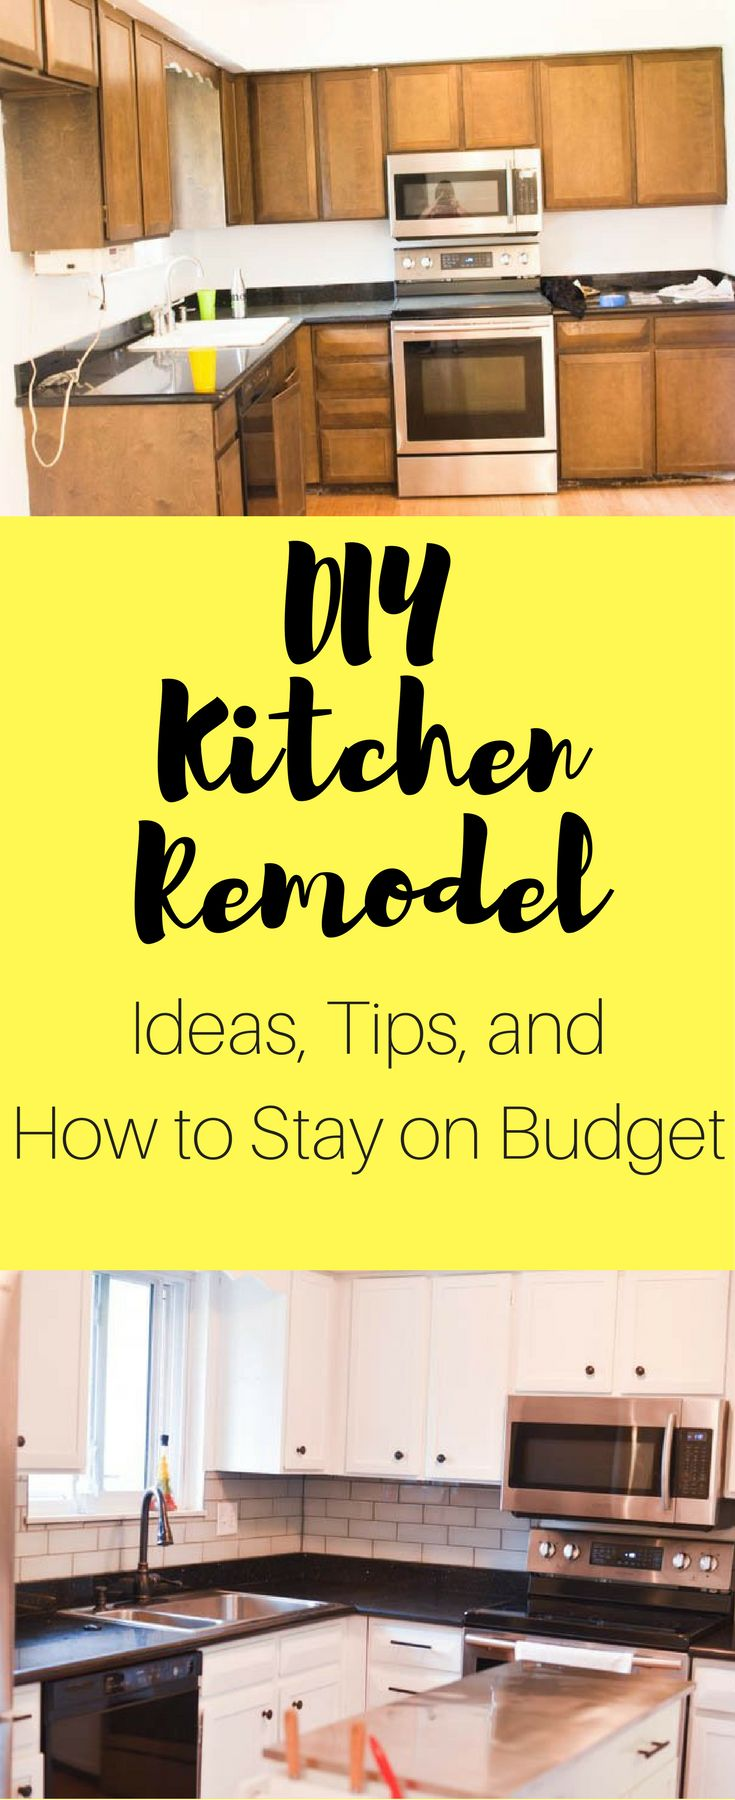 924 best Kitchens images on Pinterest